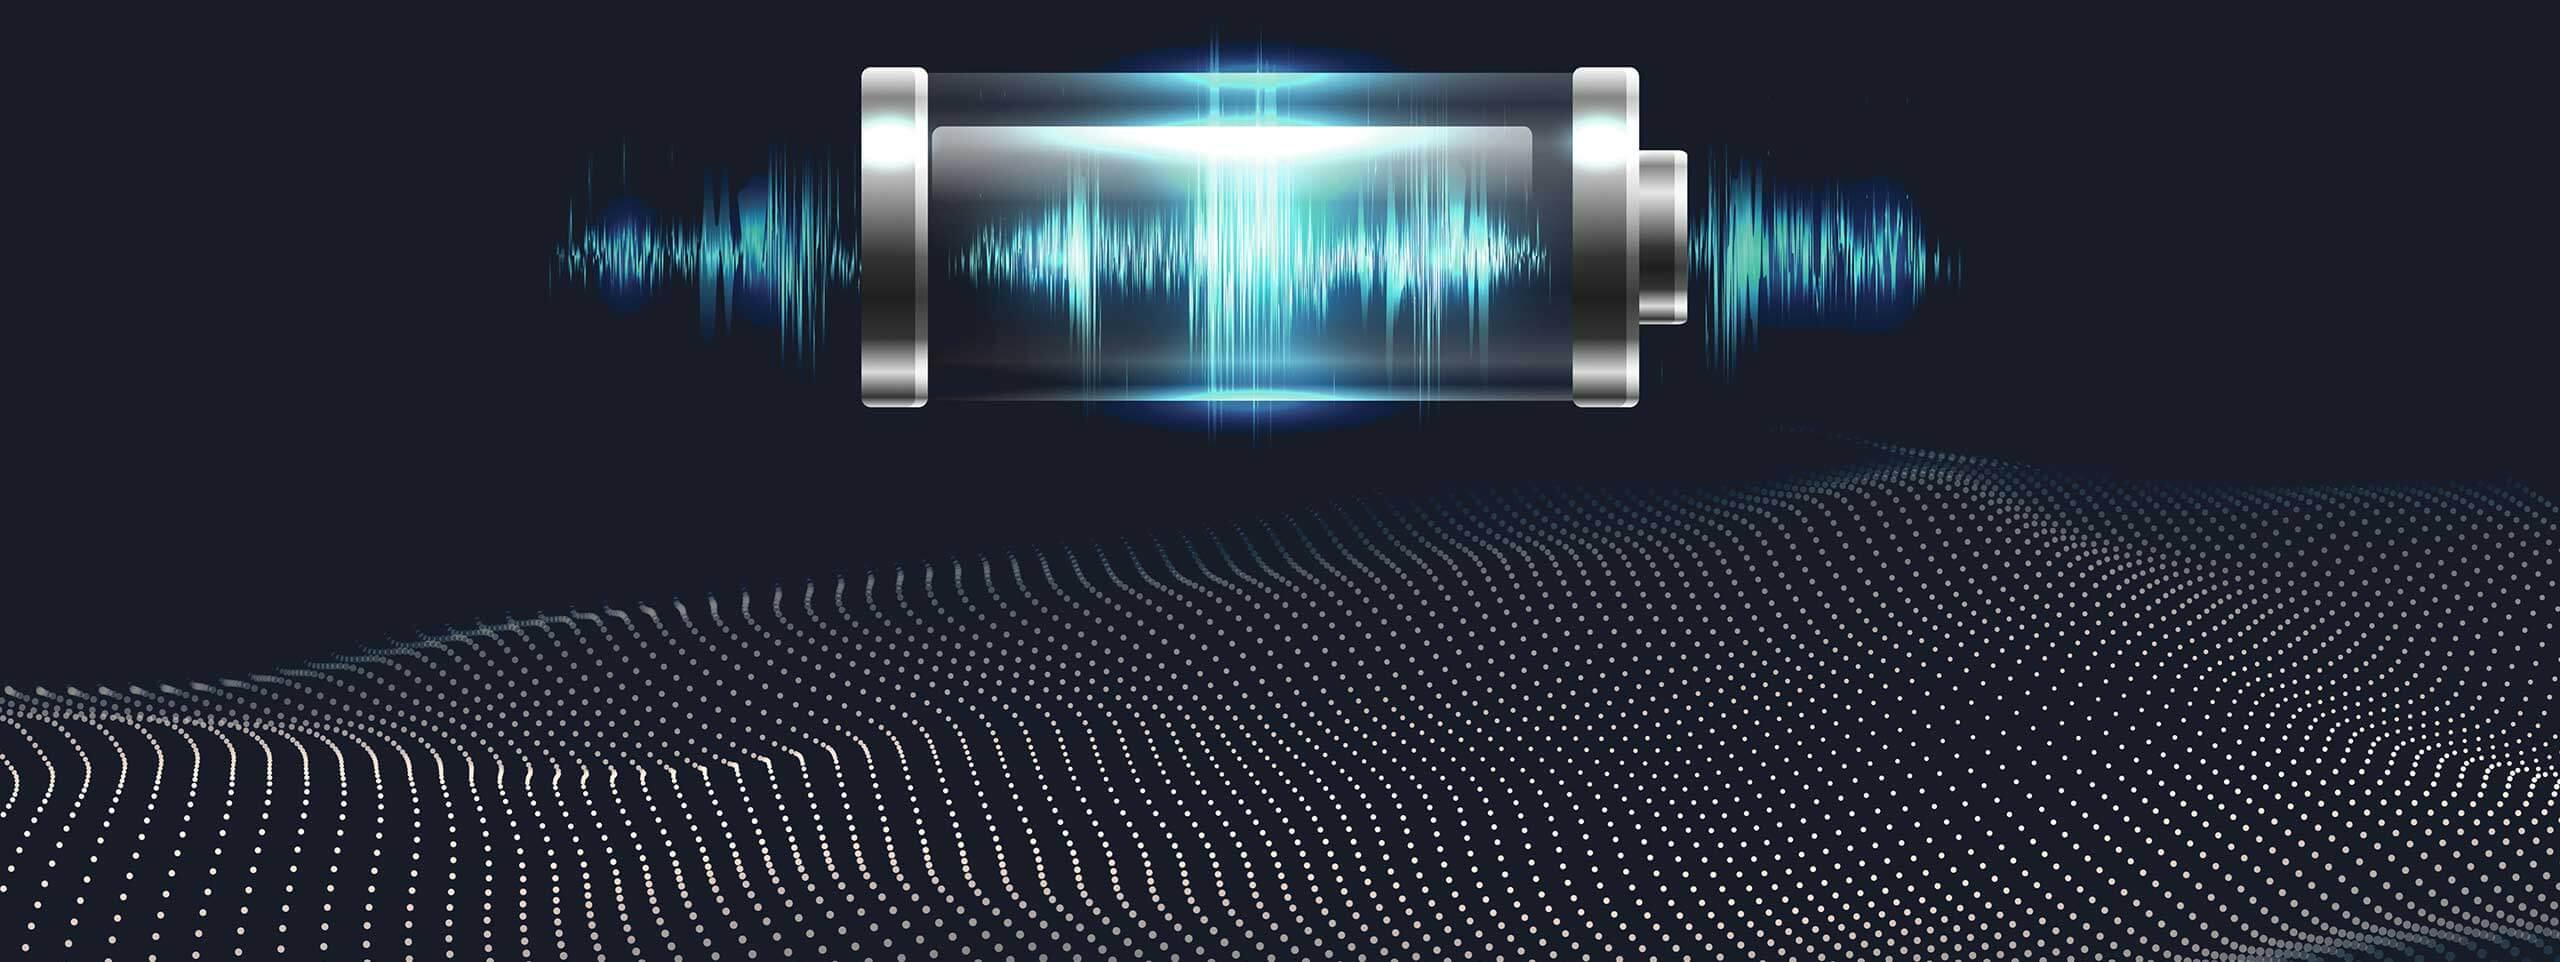 Cenate Centrifugal nanotechnology